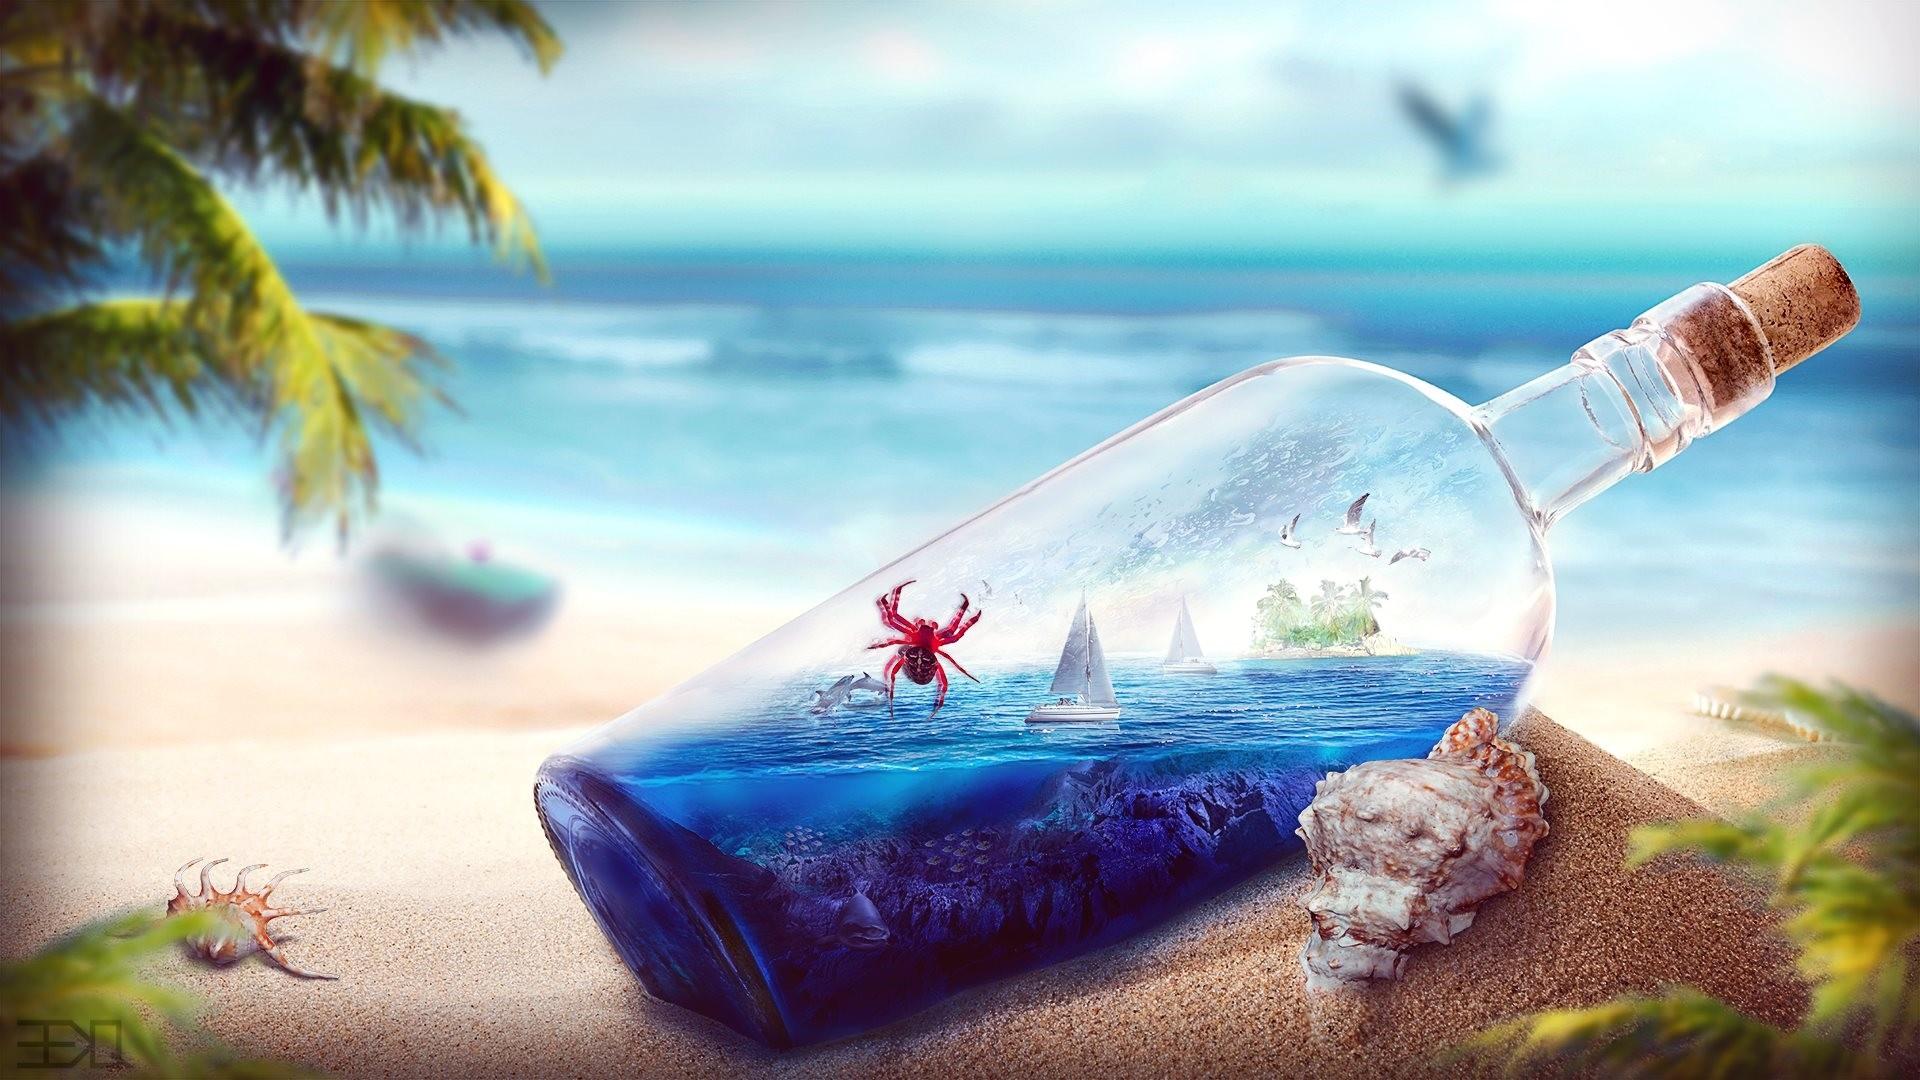 Ship In A Bottle Background Wallpaper